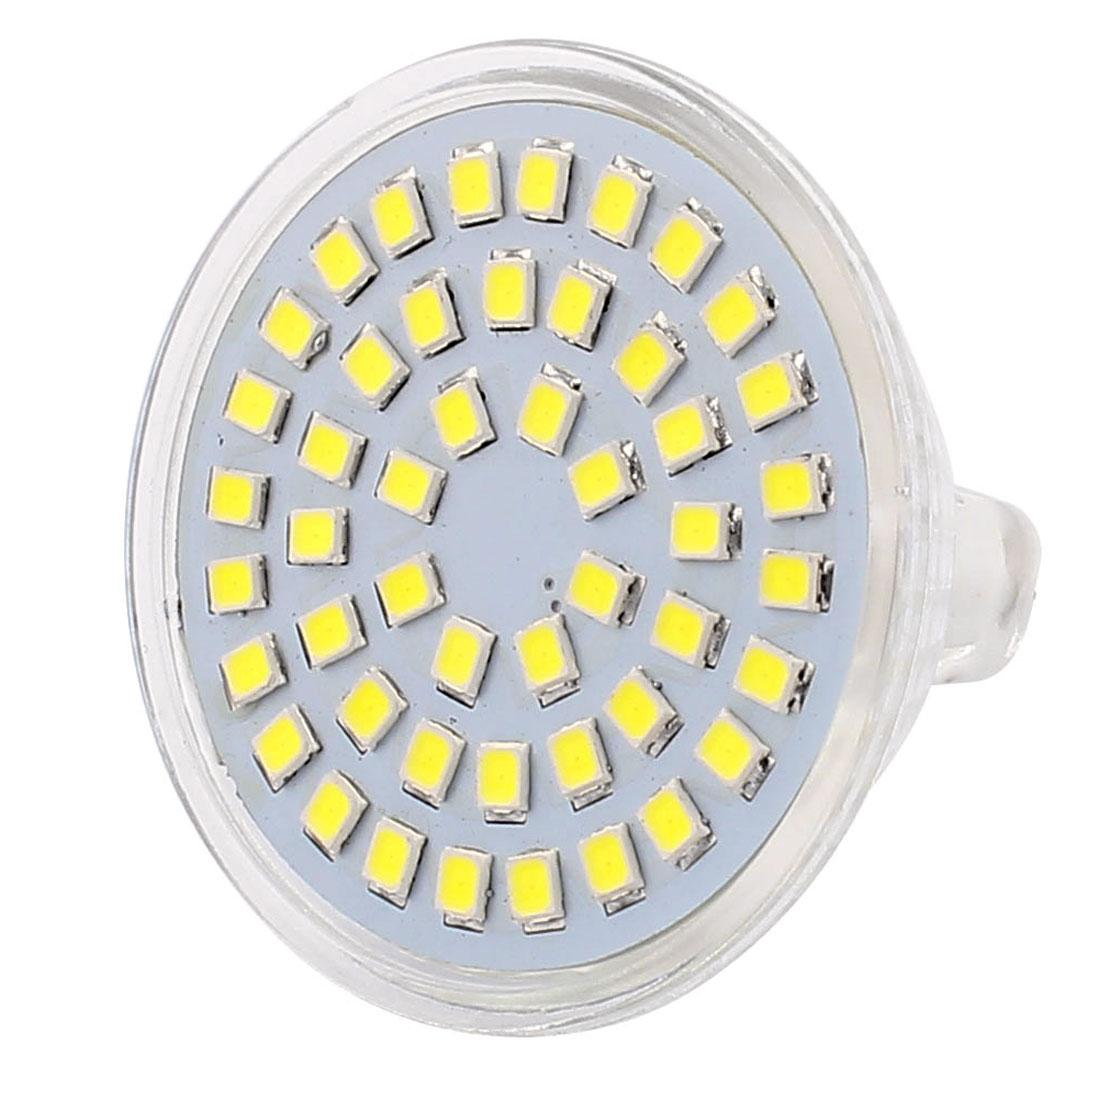 MR16 SMD 2835 48 LEDs Glass Energy-Saving LED Lamp Bulb White AC 220V 4W